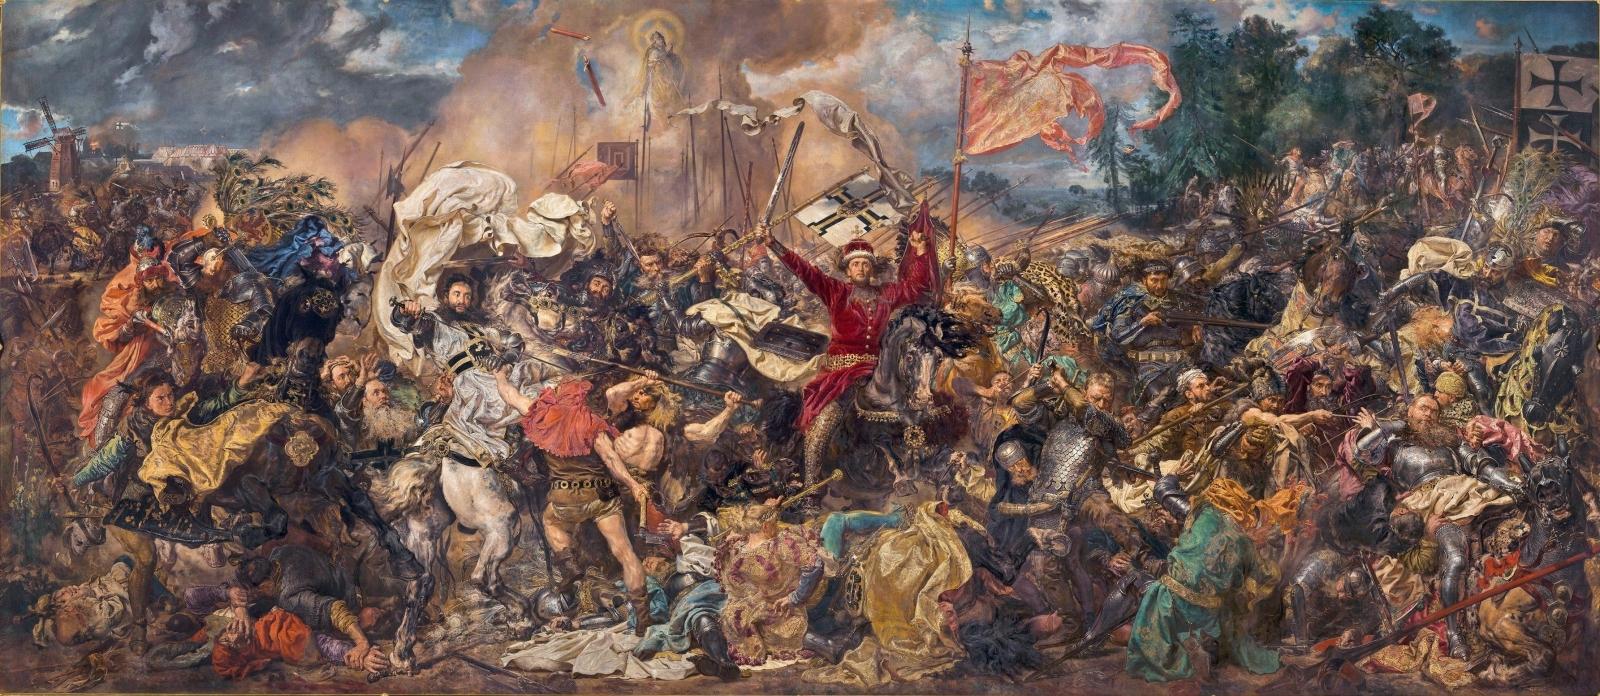 Battle of Grunwald